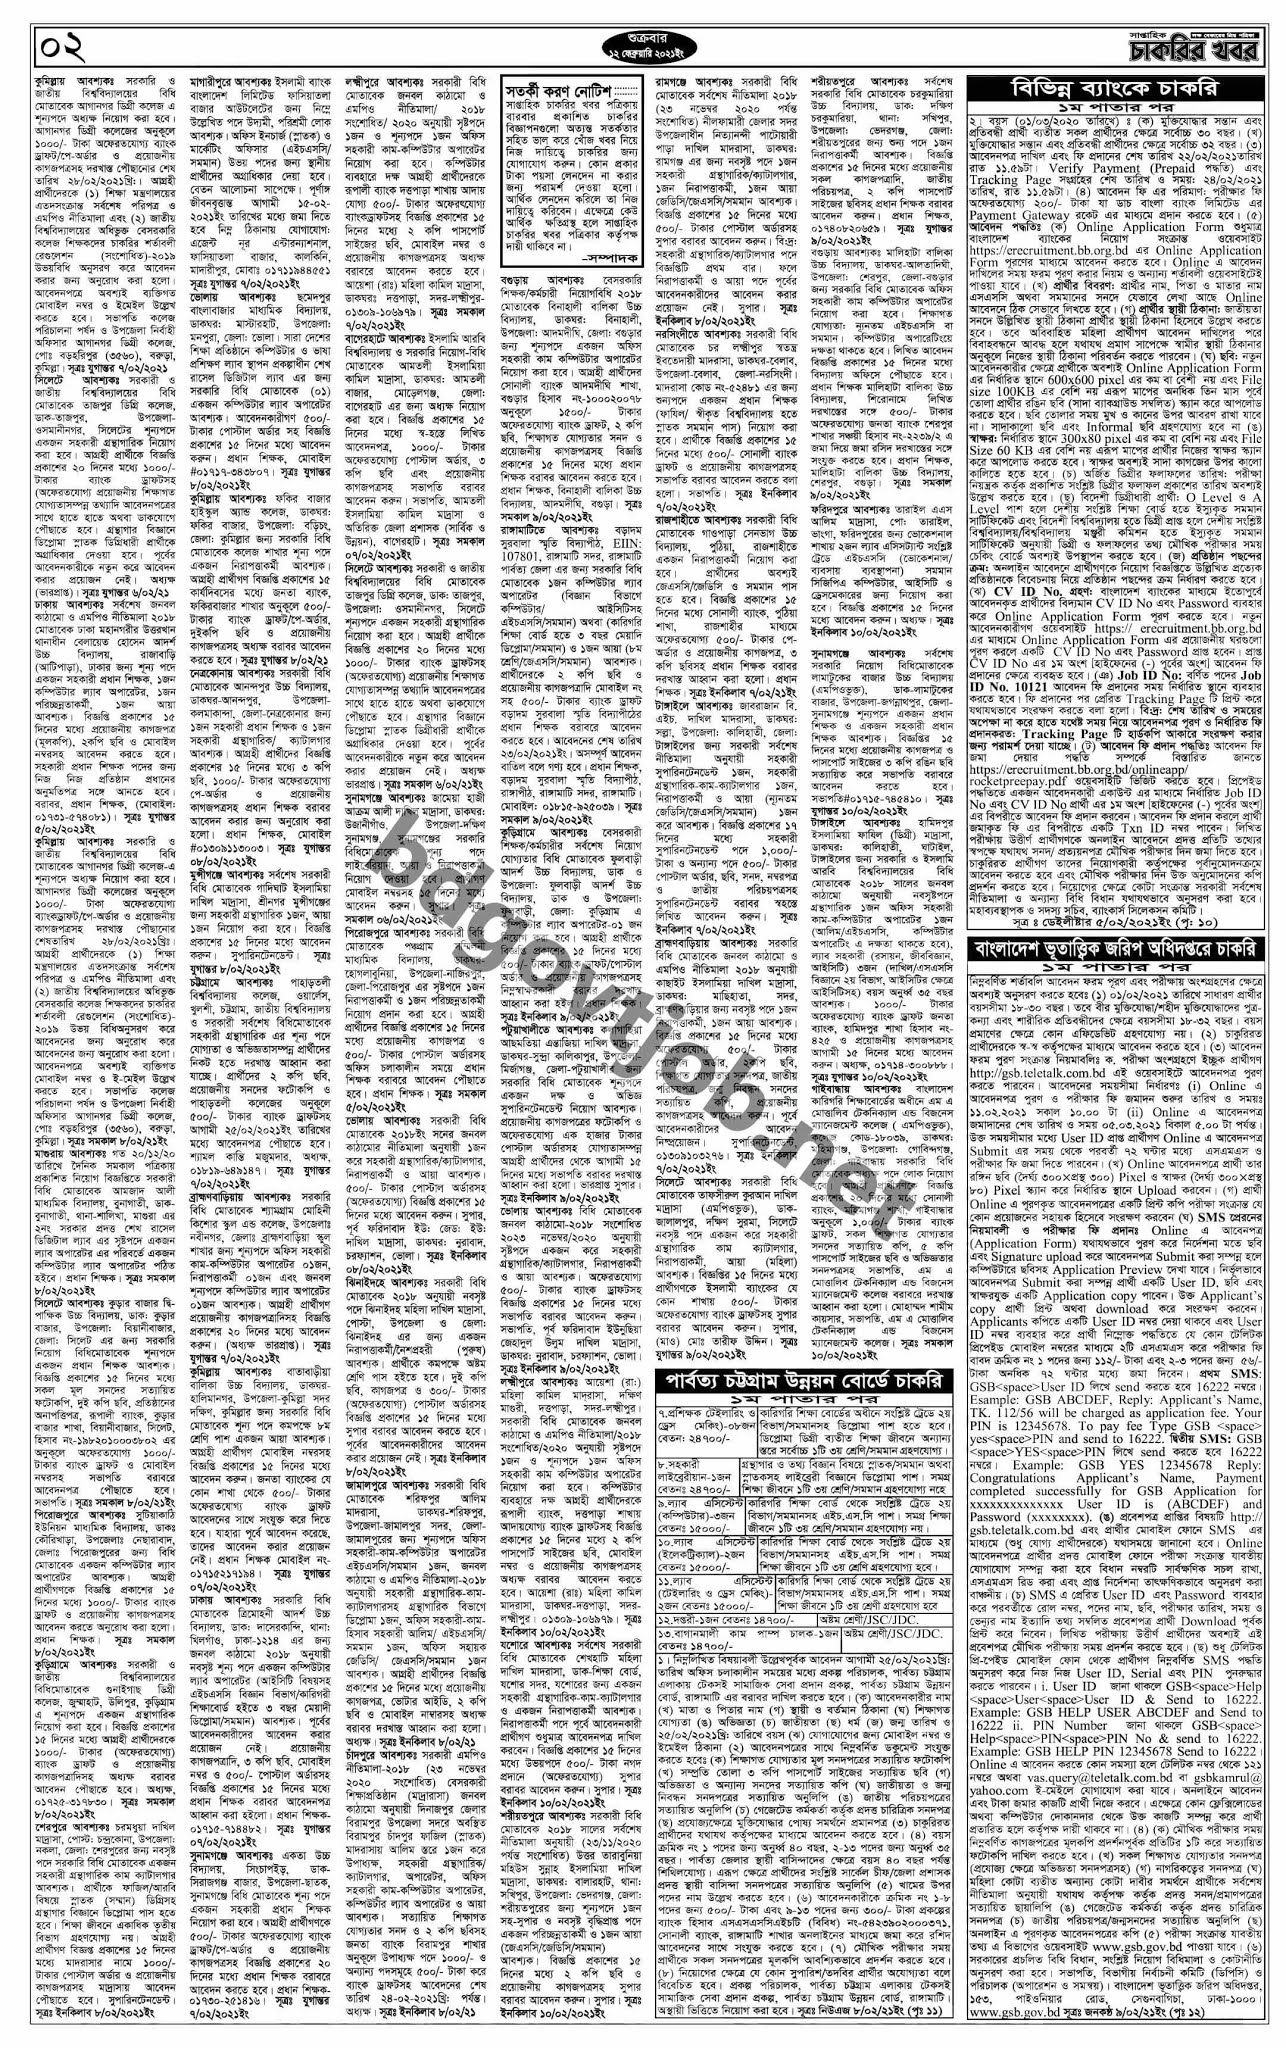 Saptahik Chakrir Khobor Potrika 19 February 2021 - সাপ্তাহিক চাকরির খবর পত্রিকা ১৯ ফেব্রুয়ারি ২০২১